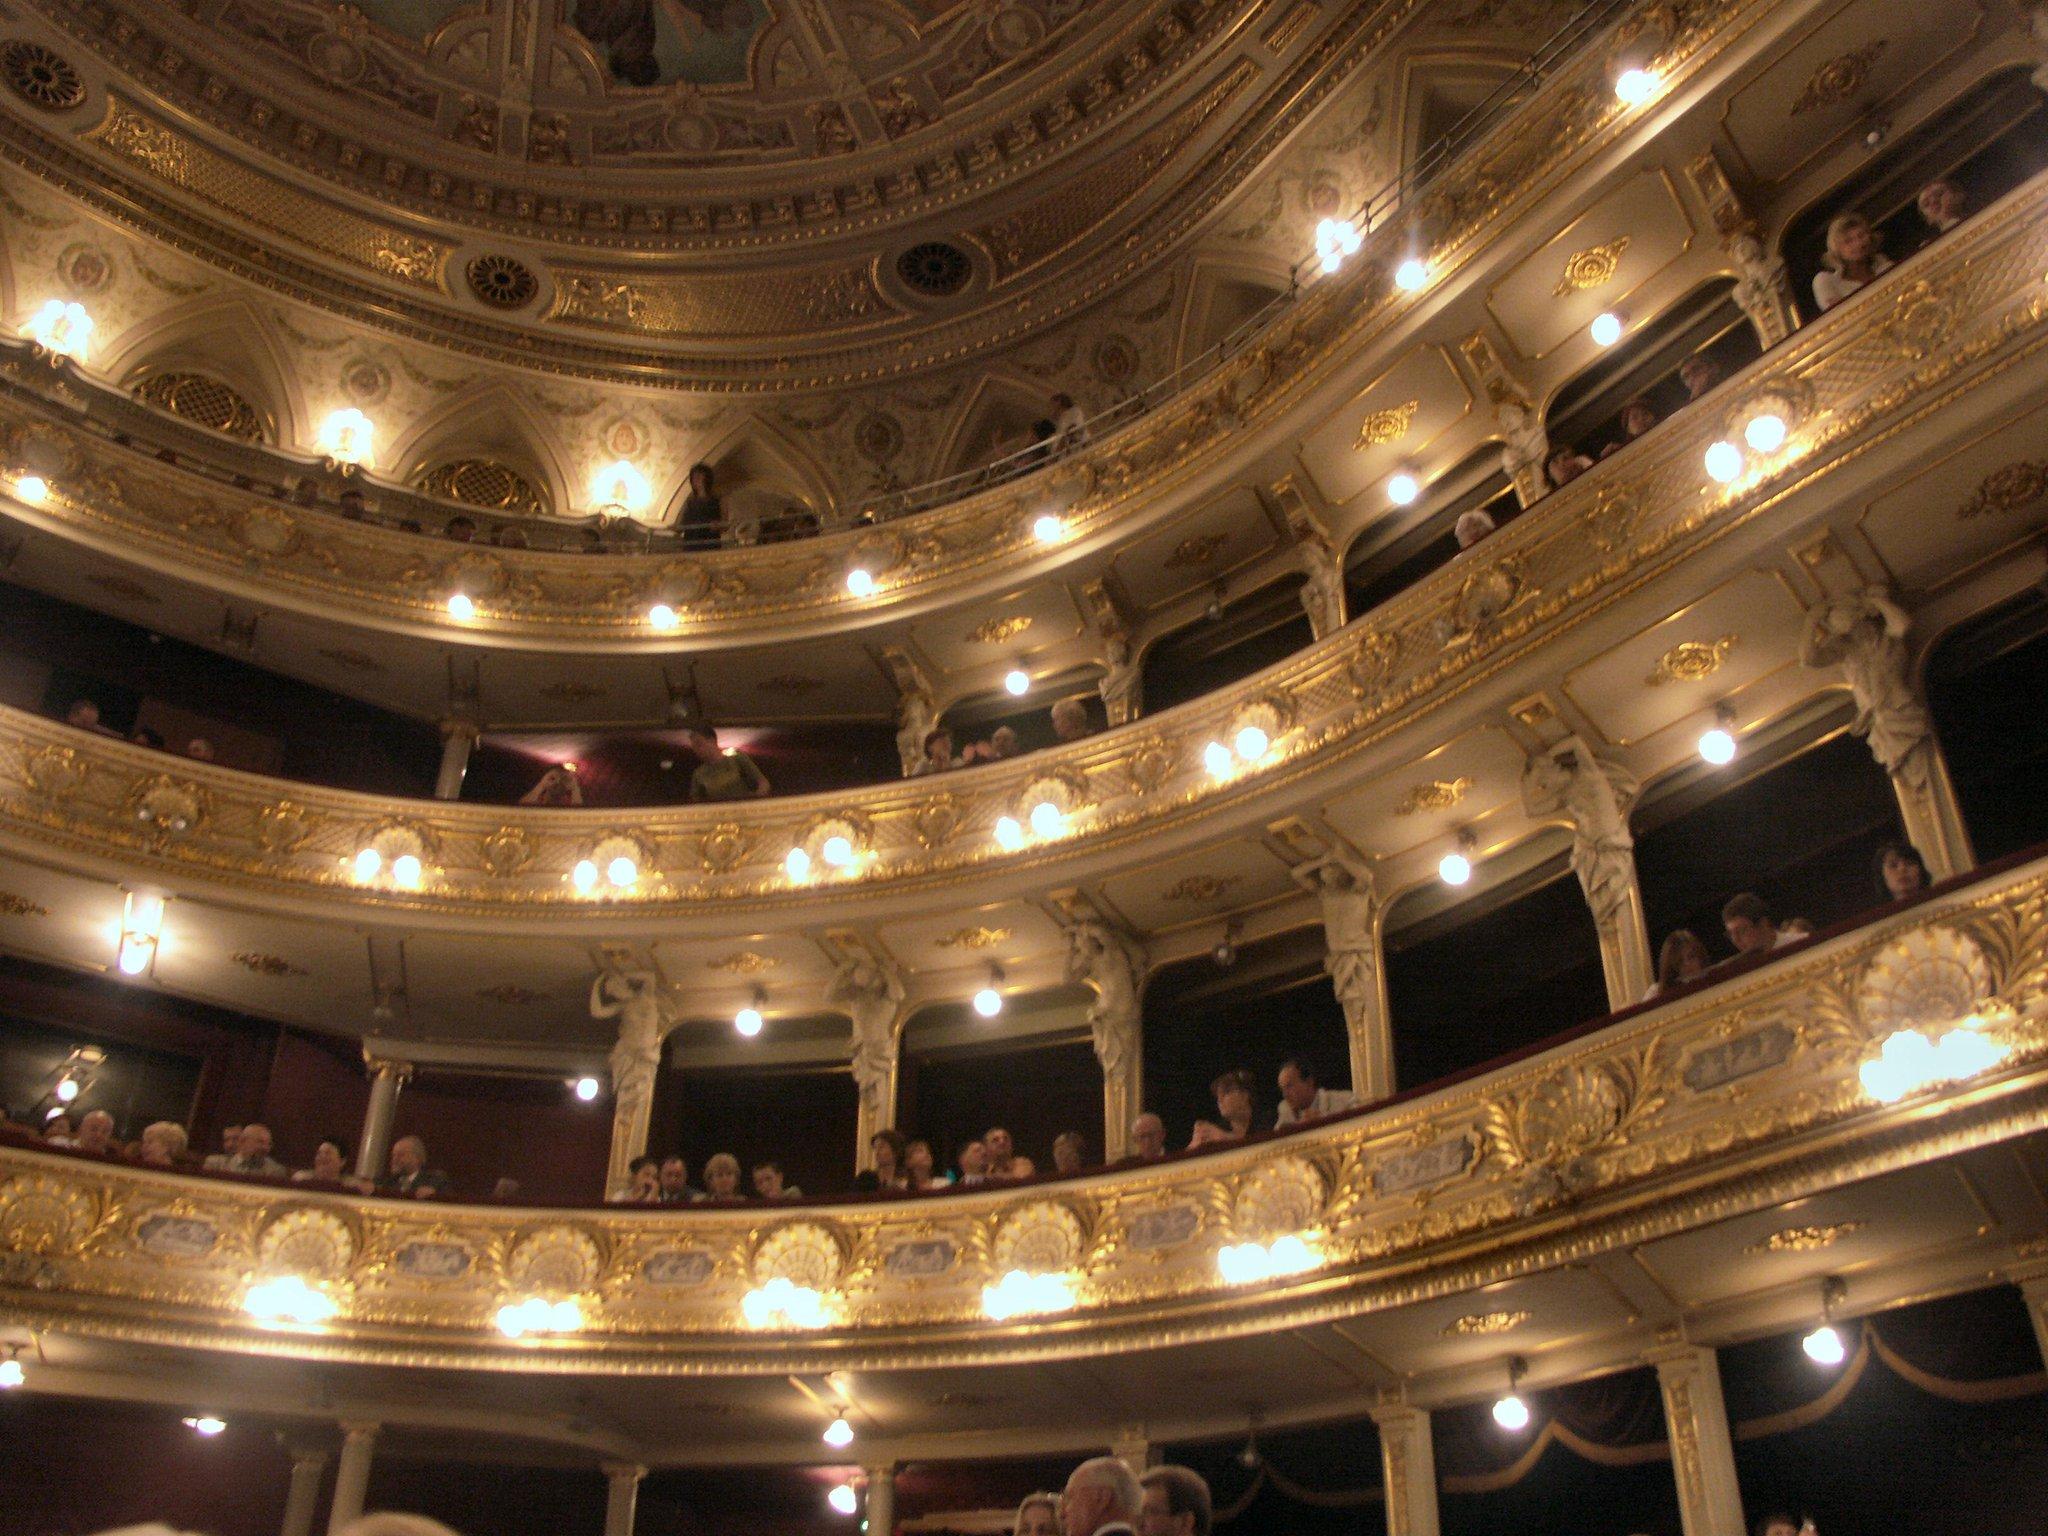 картинка лоджии большого театра